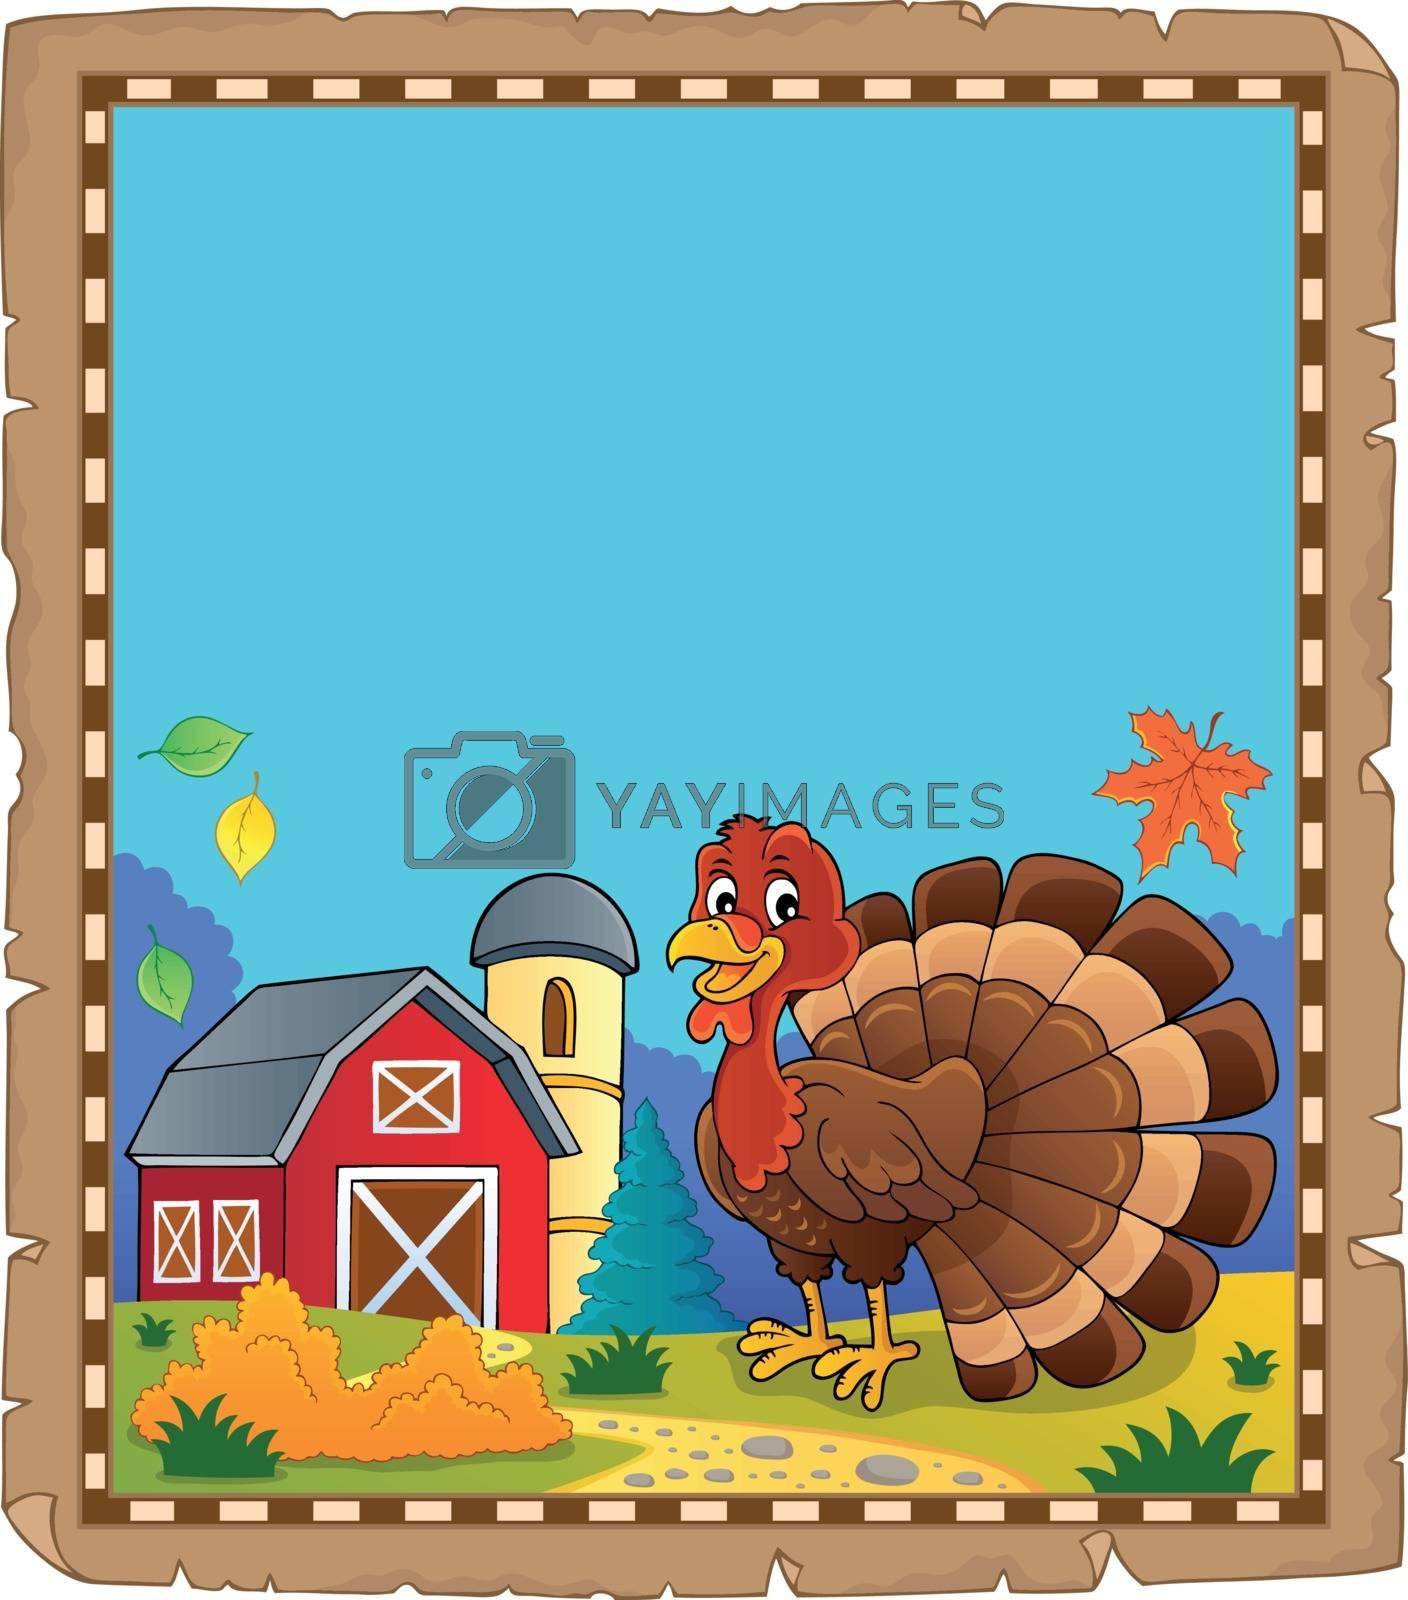 Turkey bird theme parchment 2 - eps10 vector illustration.